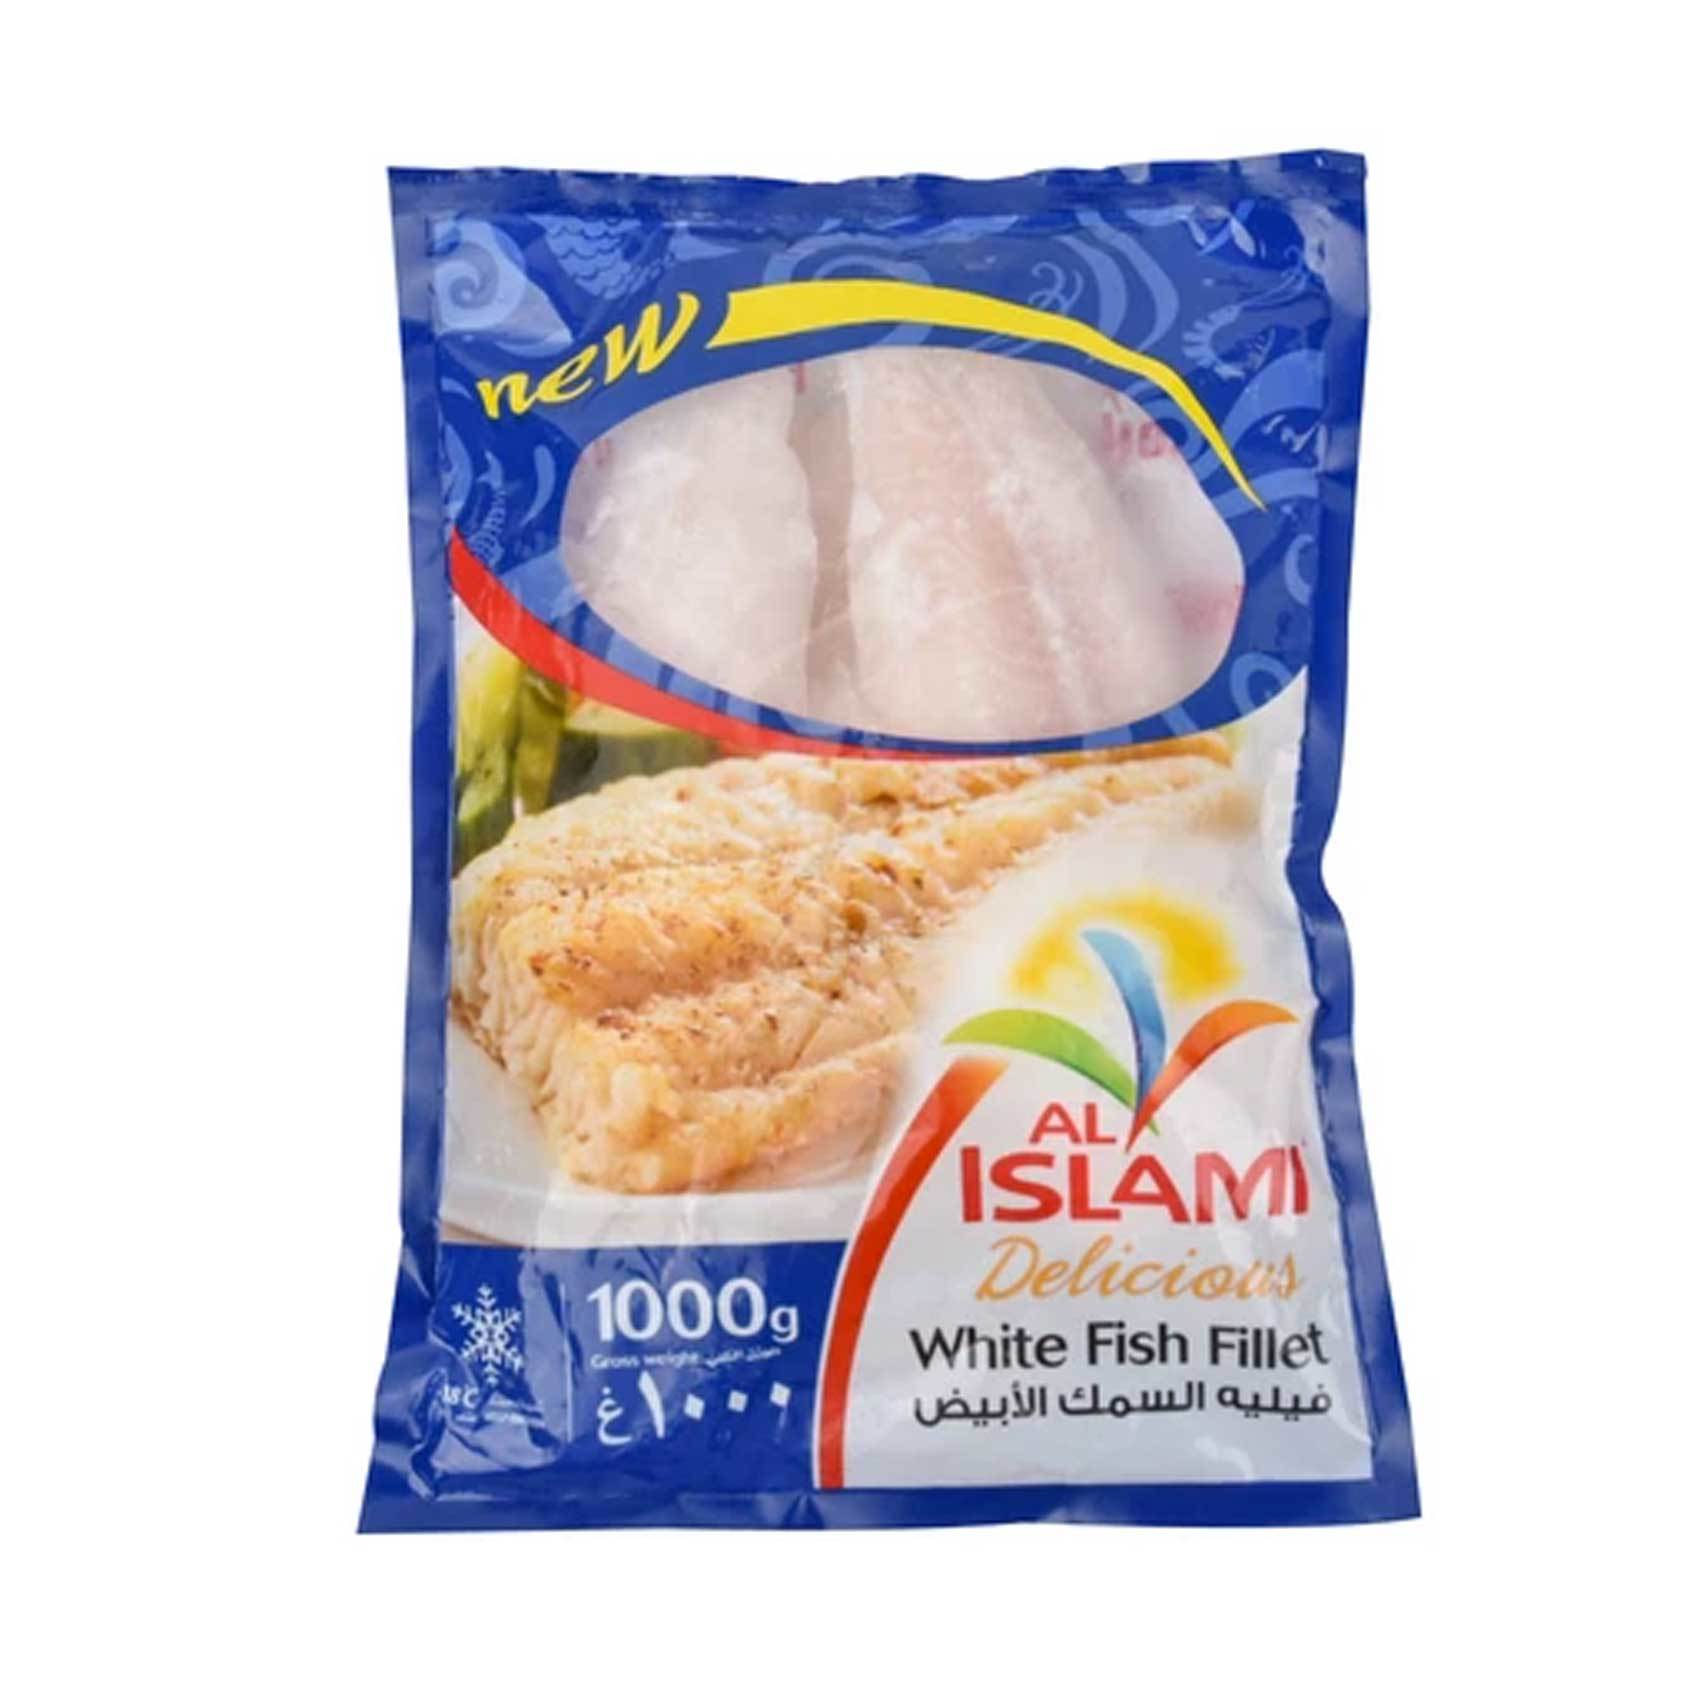 Buy Al Islami White Fish Fillet 1000g Online Shop Frozen Food On Carrefour Uae